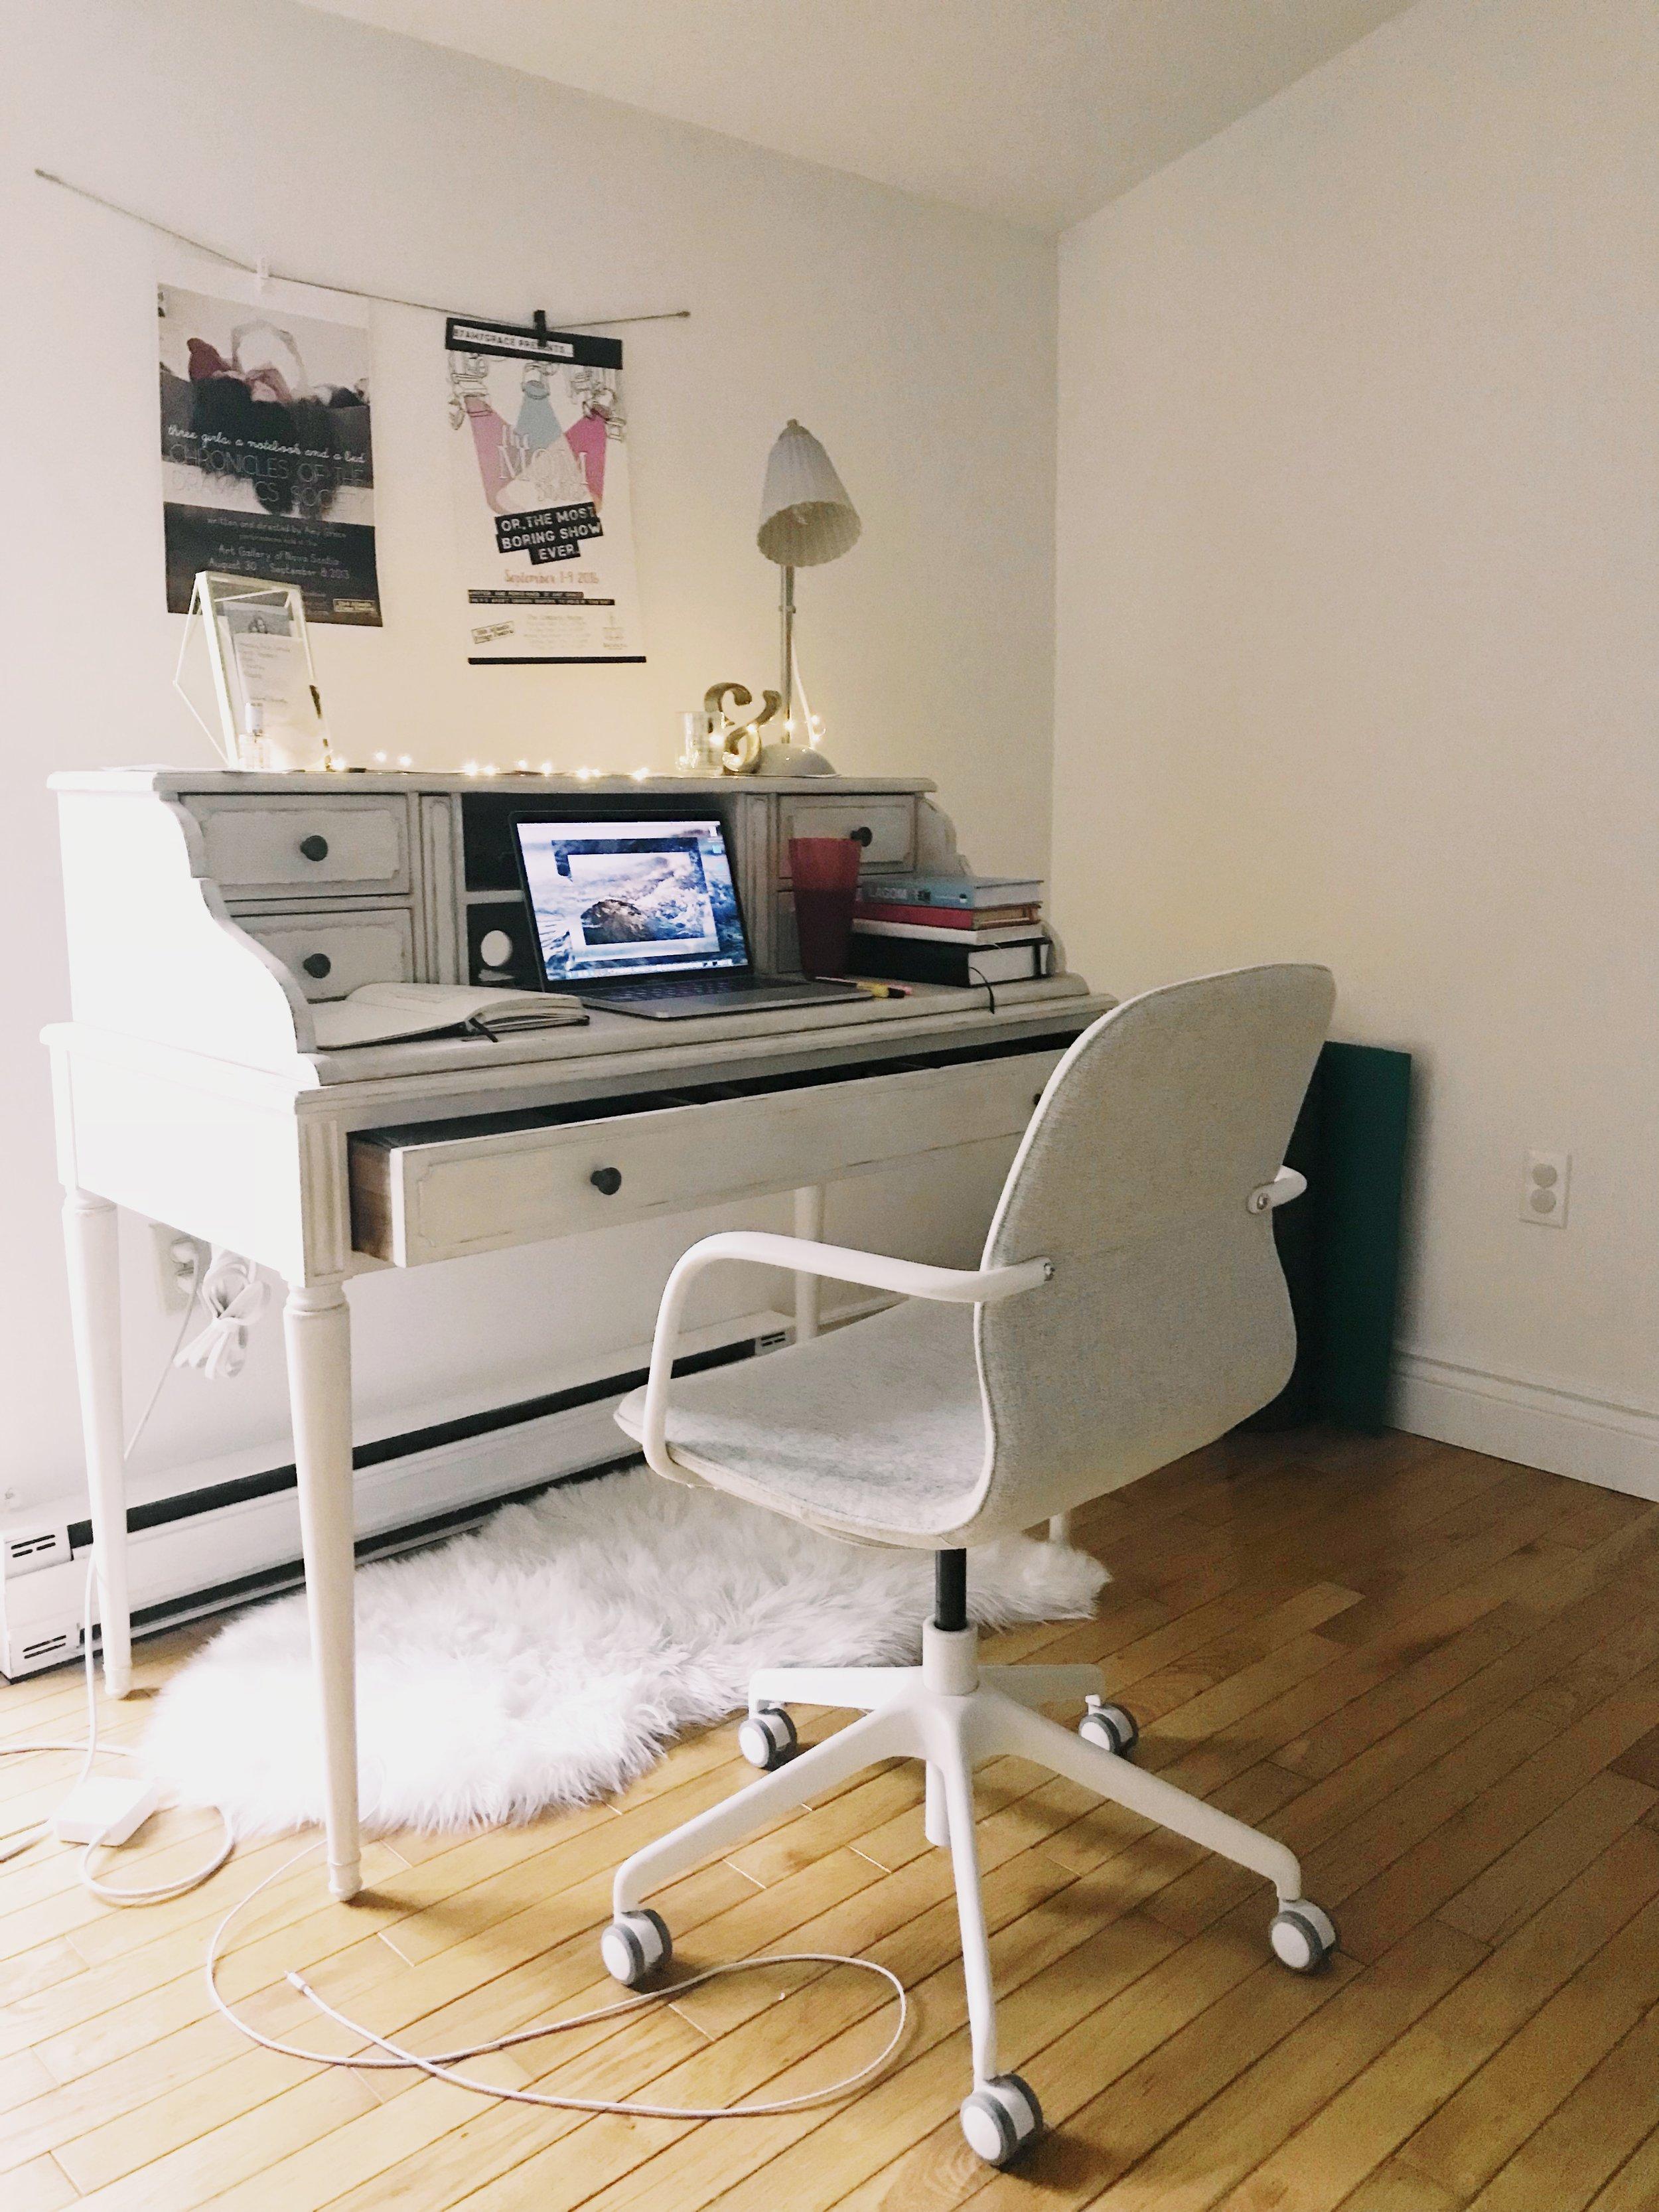 blogwriter.byamygrace